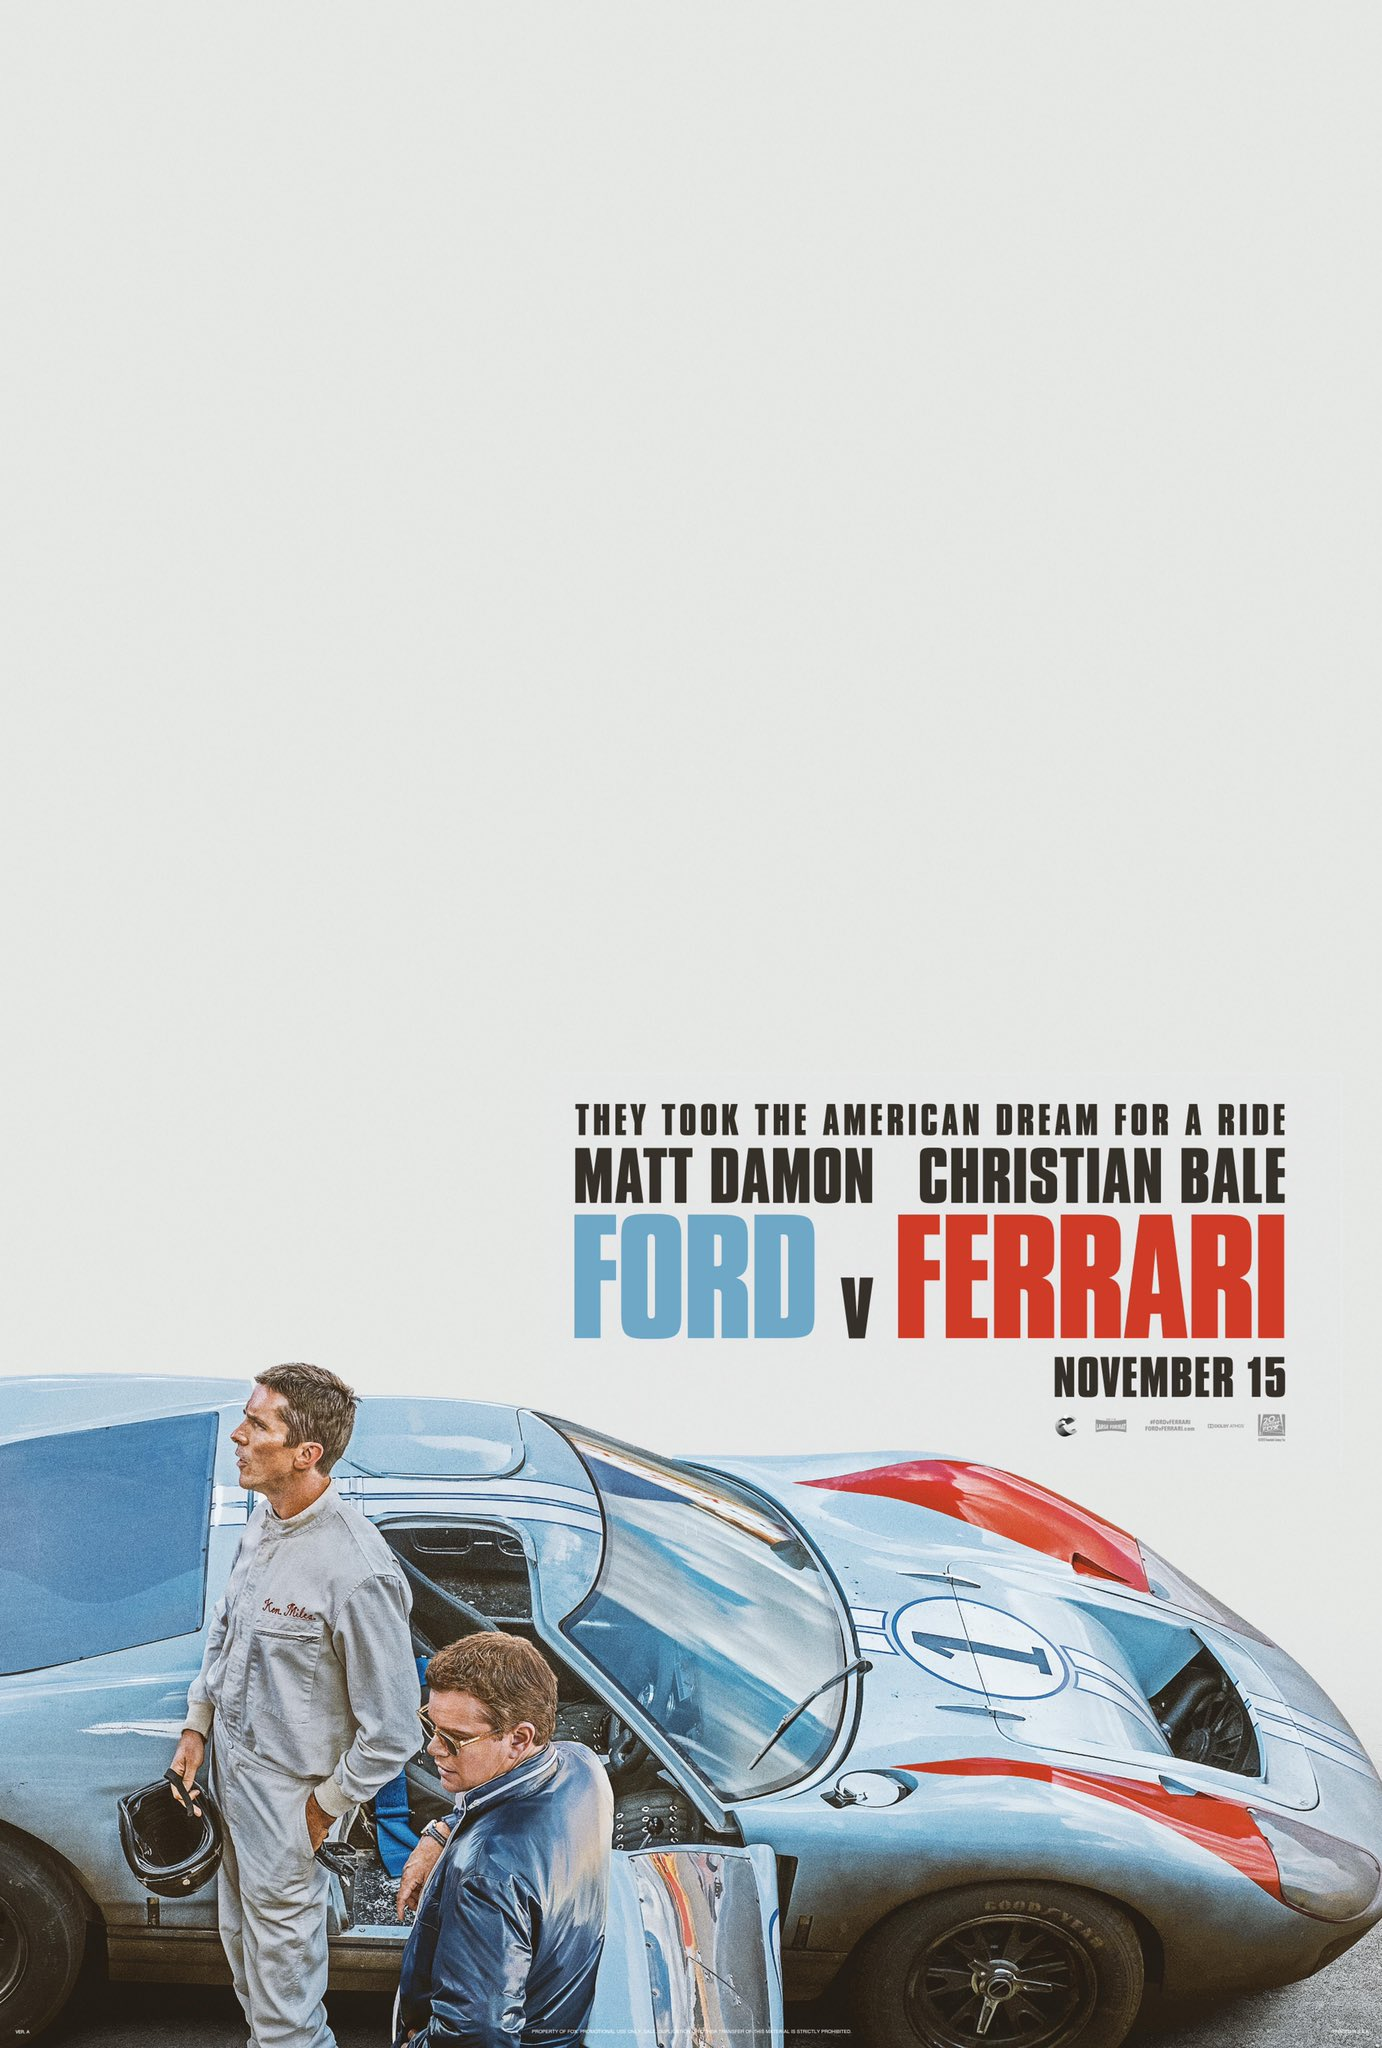 Ford V Ferrari Poster Matt Damon And Christian Bale Lead Racing Drama